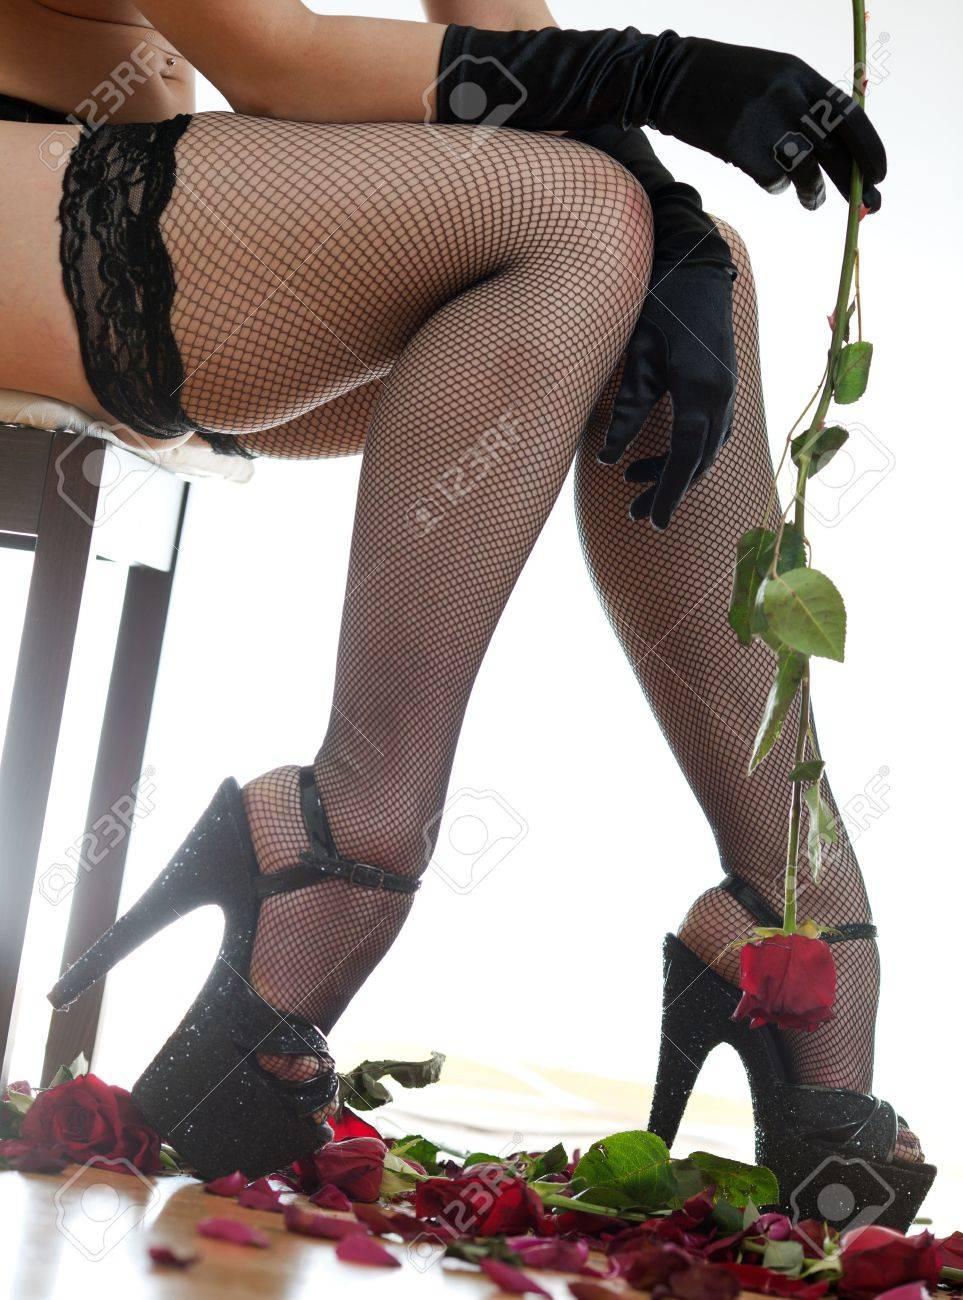 women s feet and rose Stock Photo - 18442459